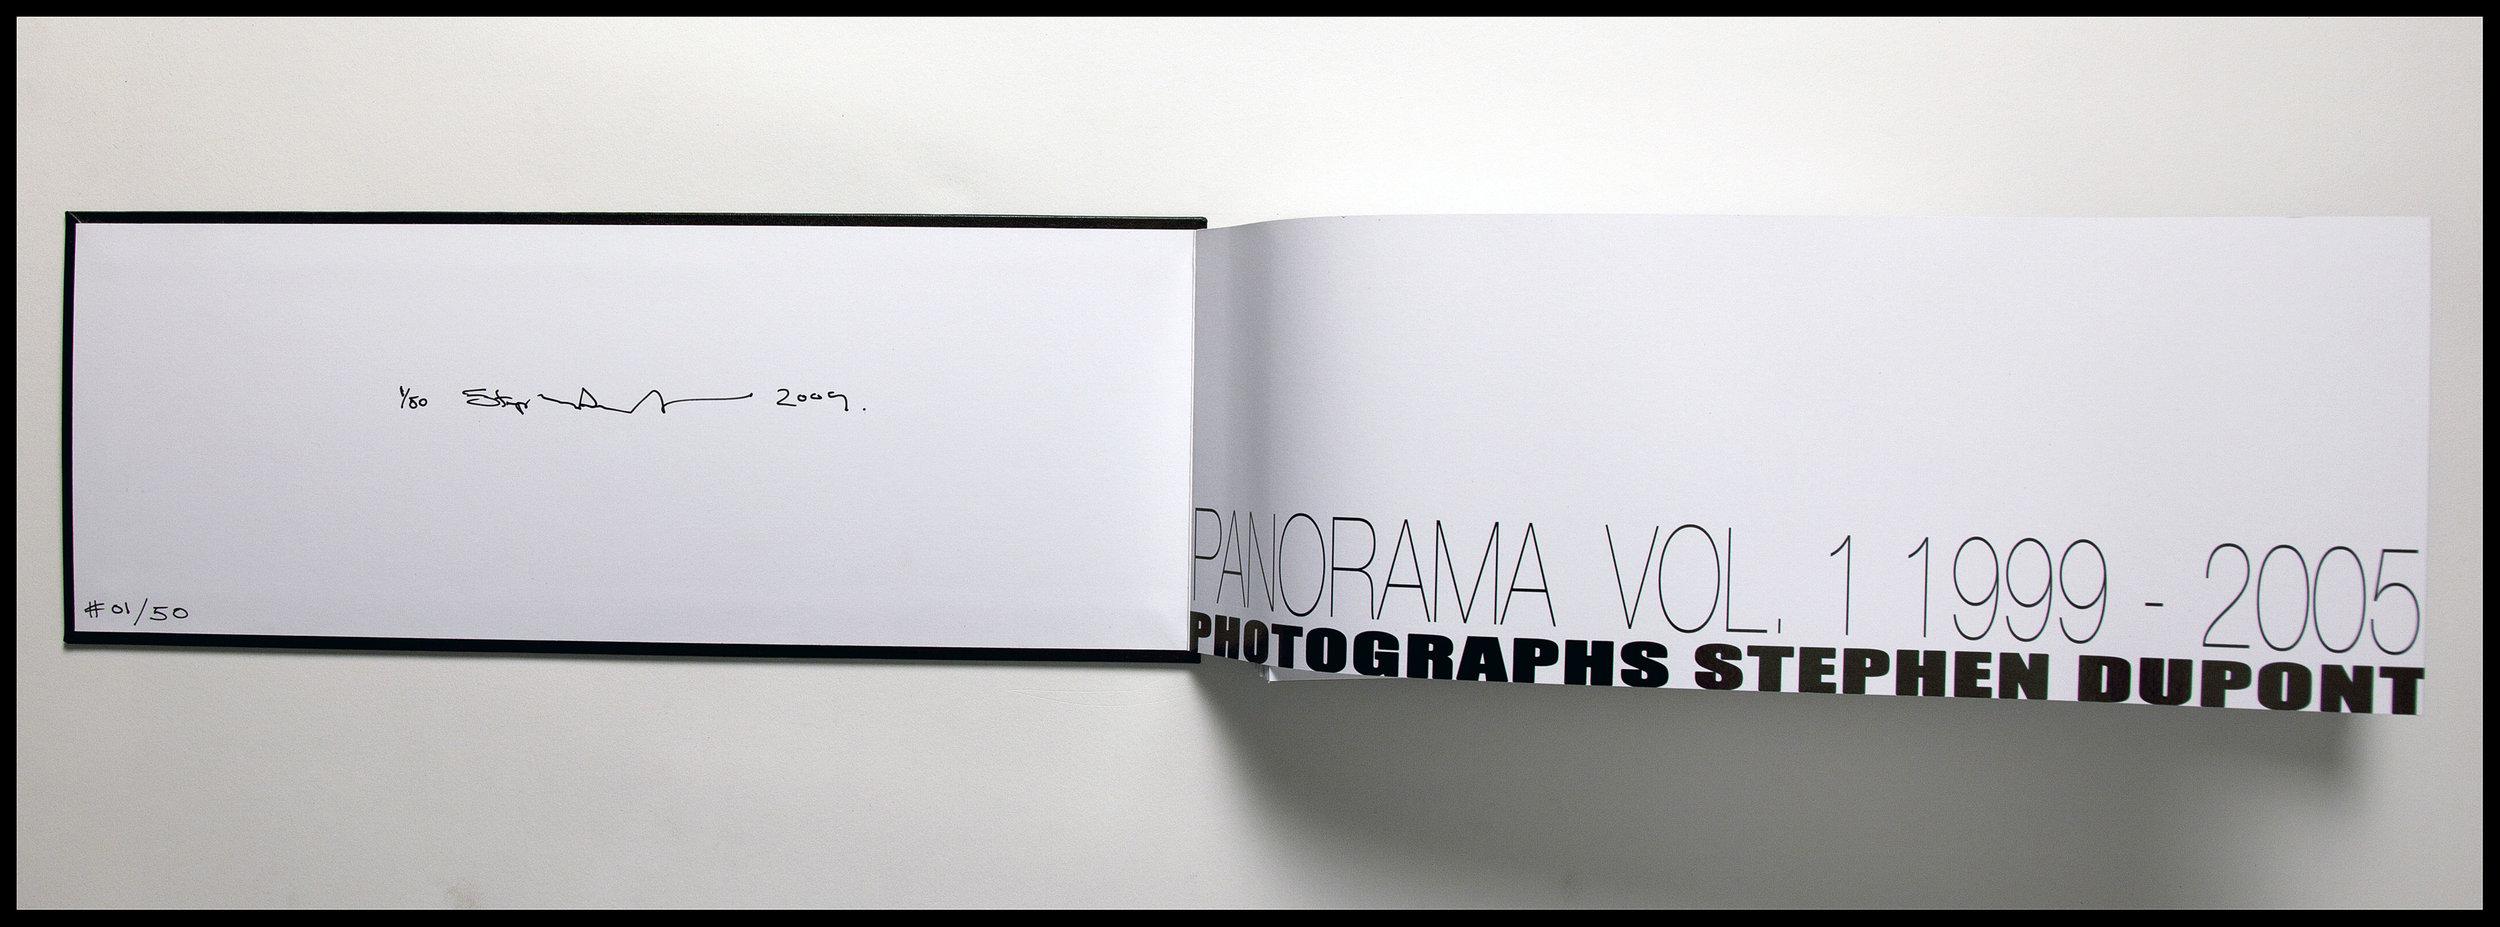 Panorama_Artist_Book_01.jpg